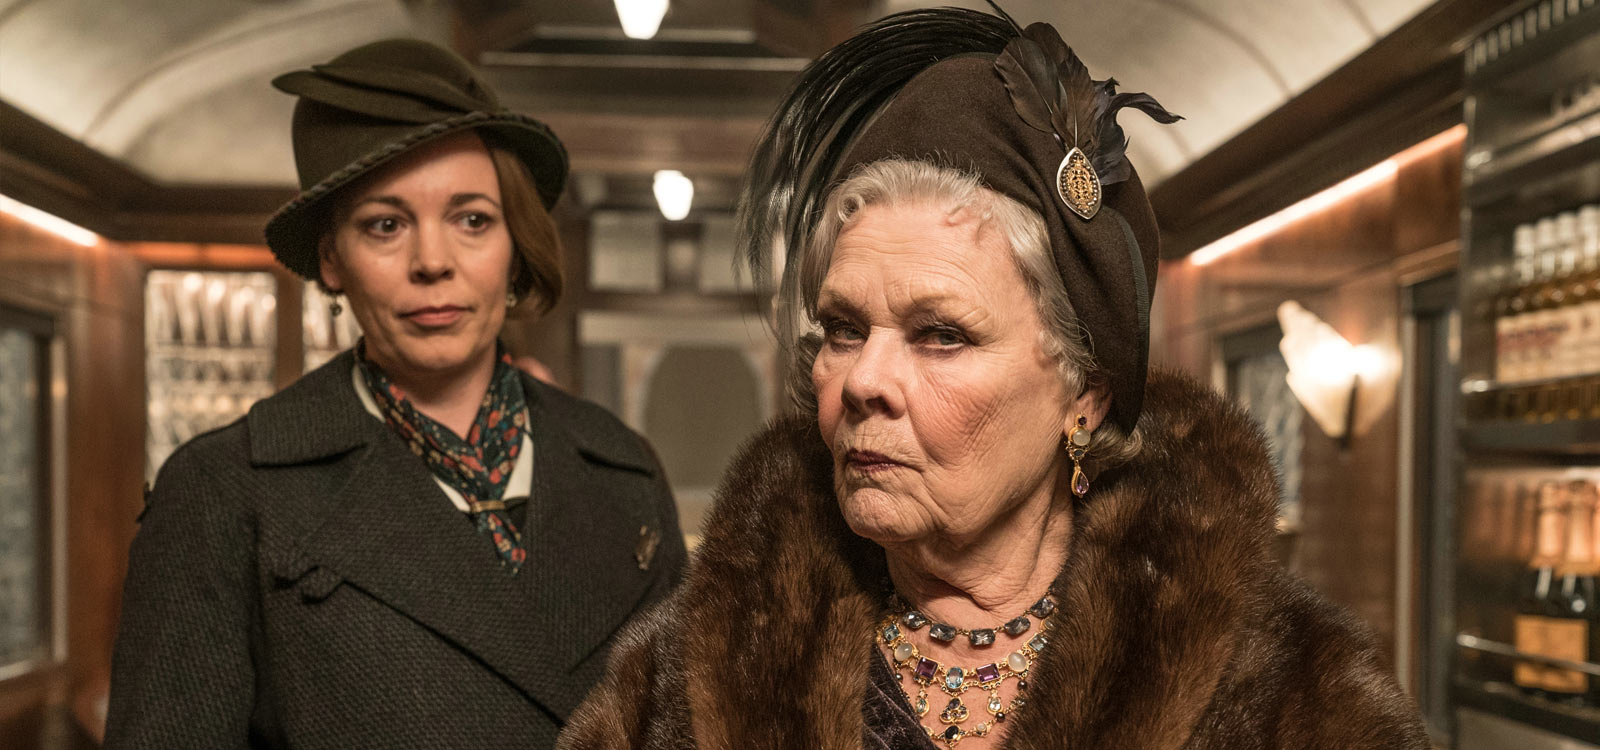 Mord im Orient-Express Filmkritik Olivia Colman Judi Dench